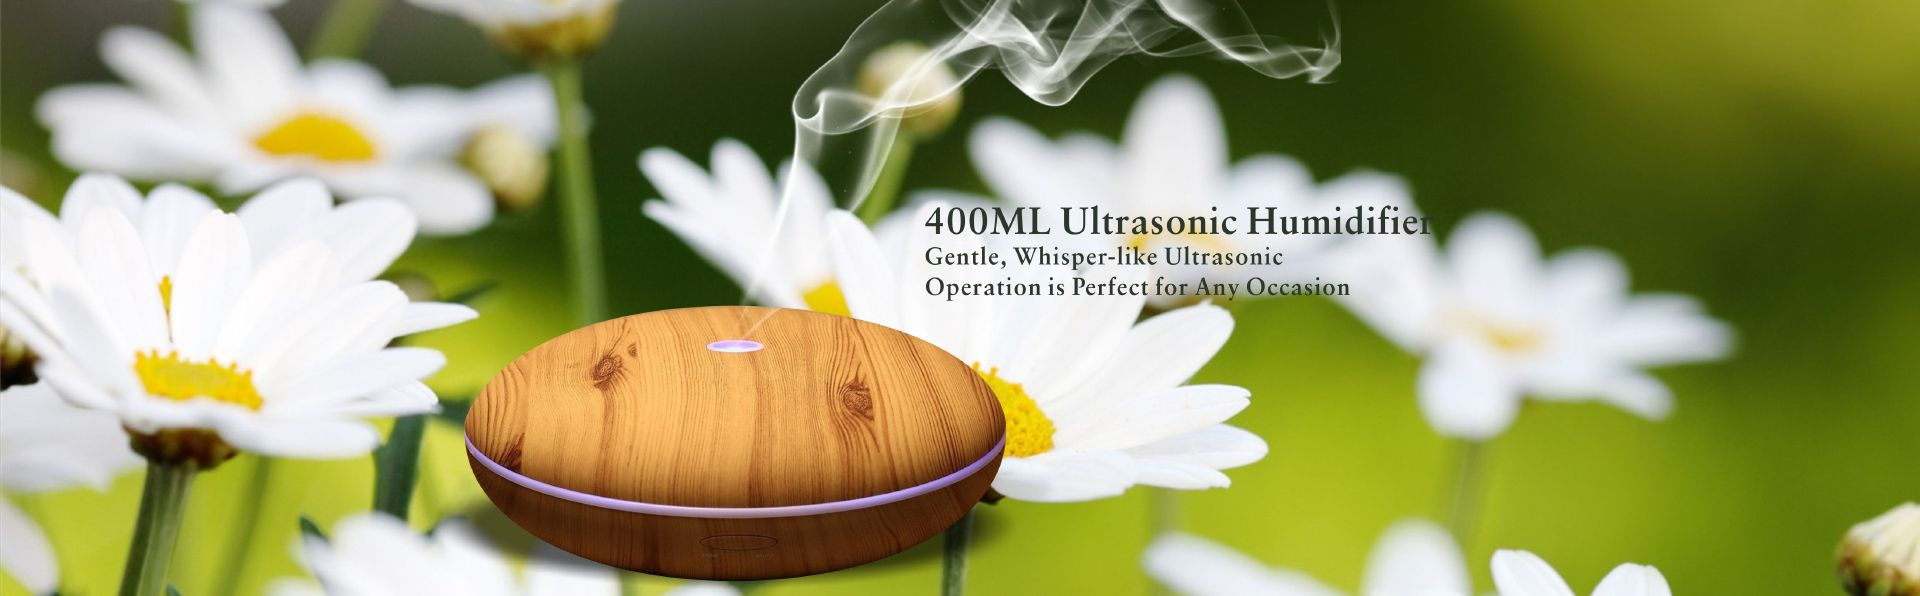 Aromacare 200ml Aroma diffuser humidifier